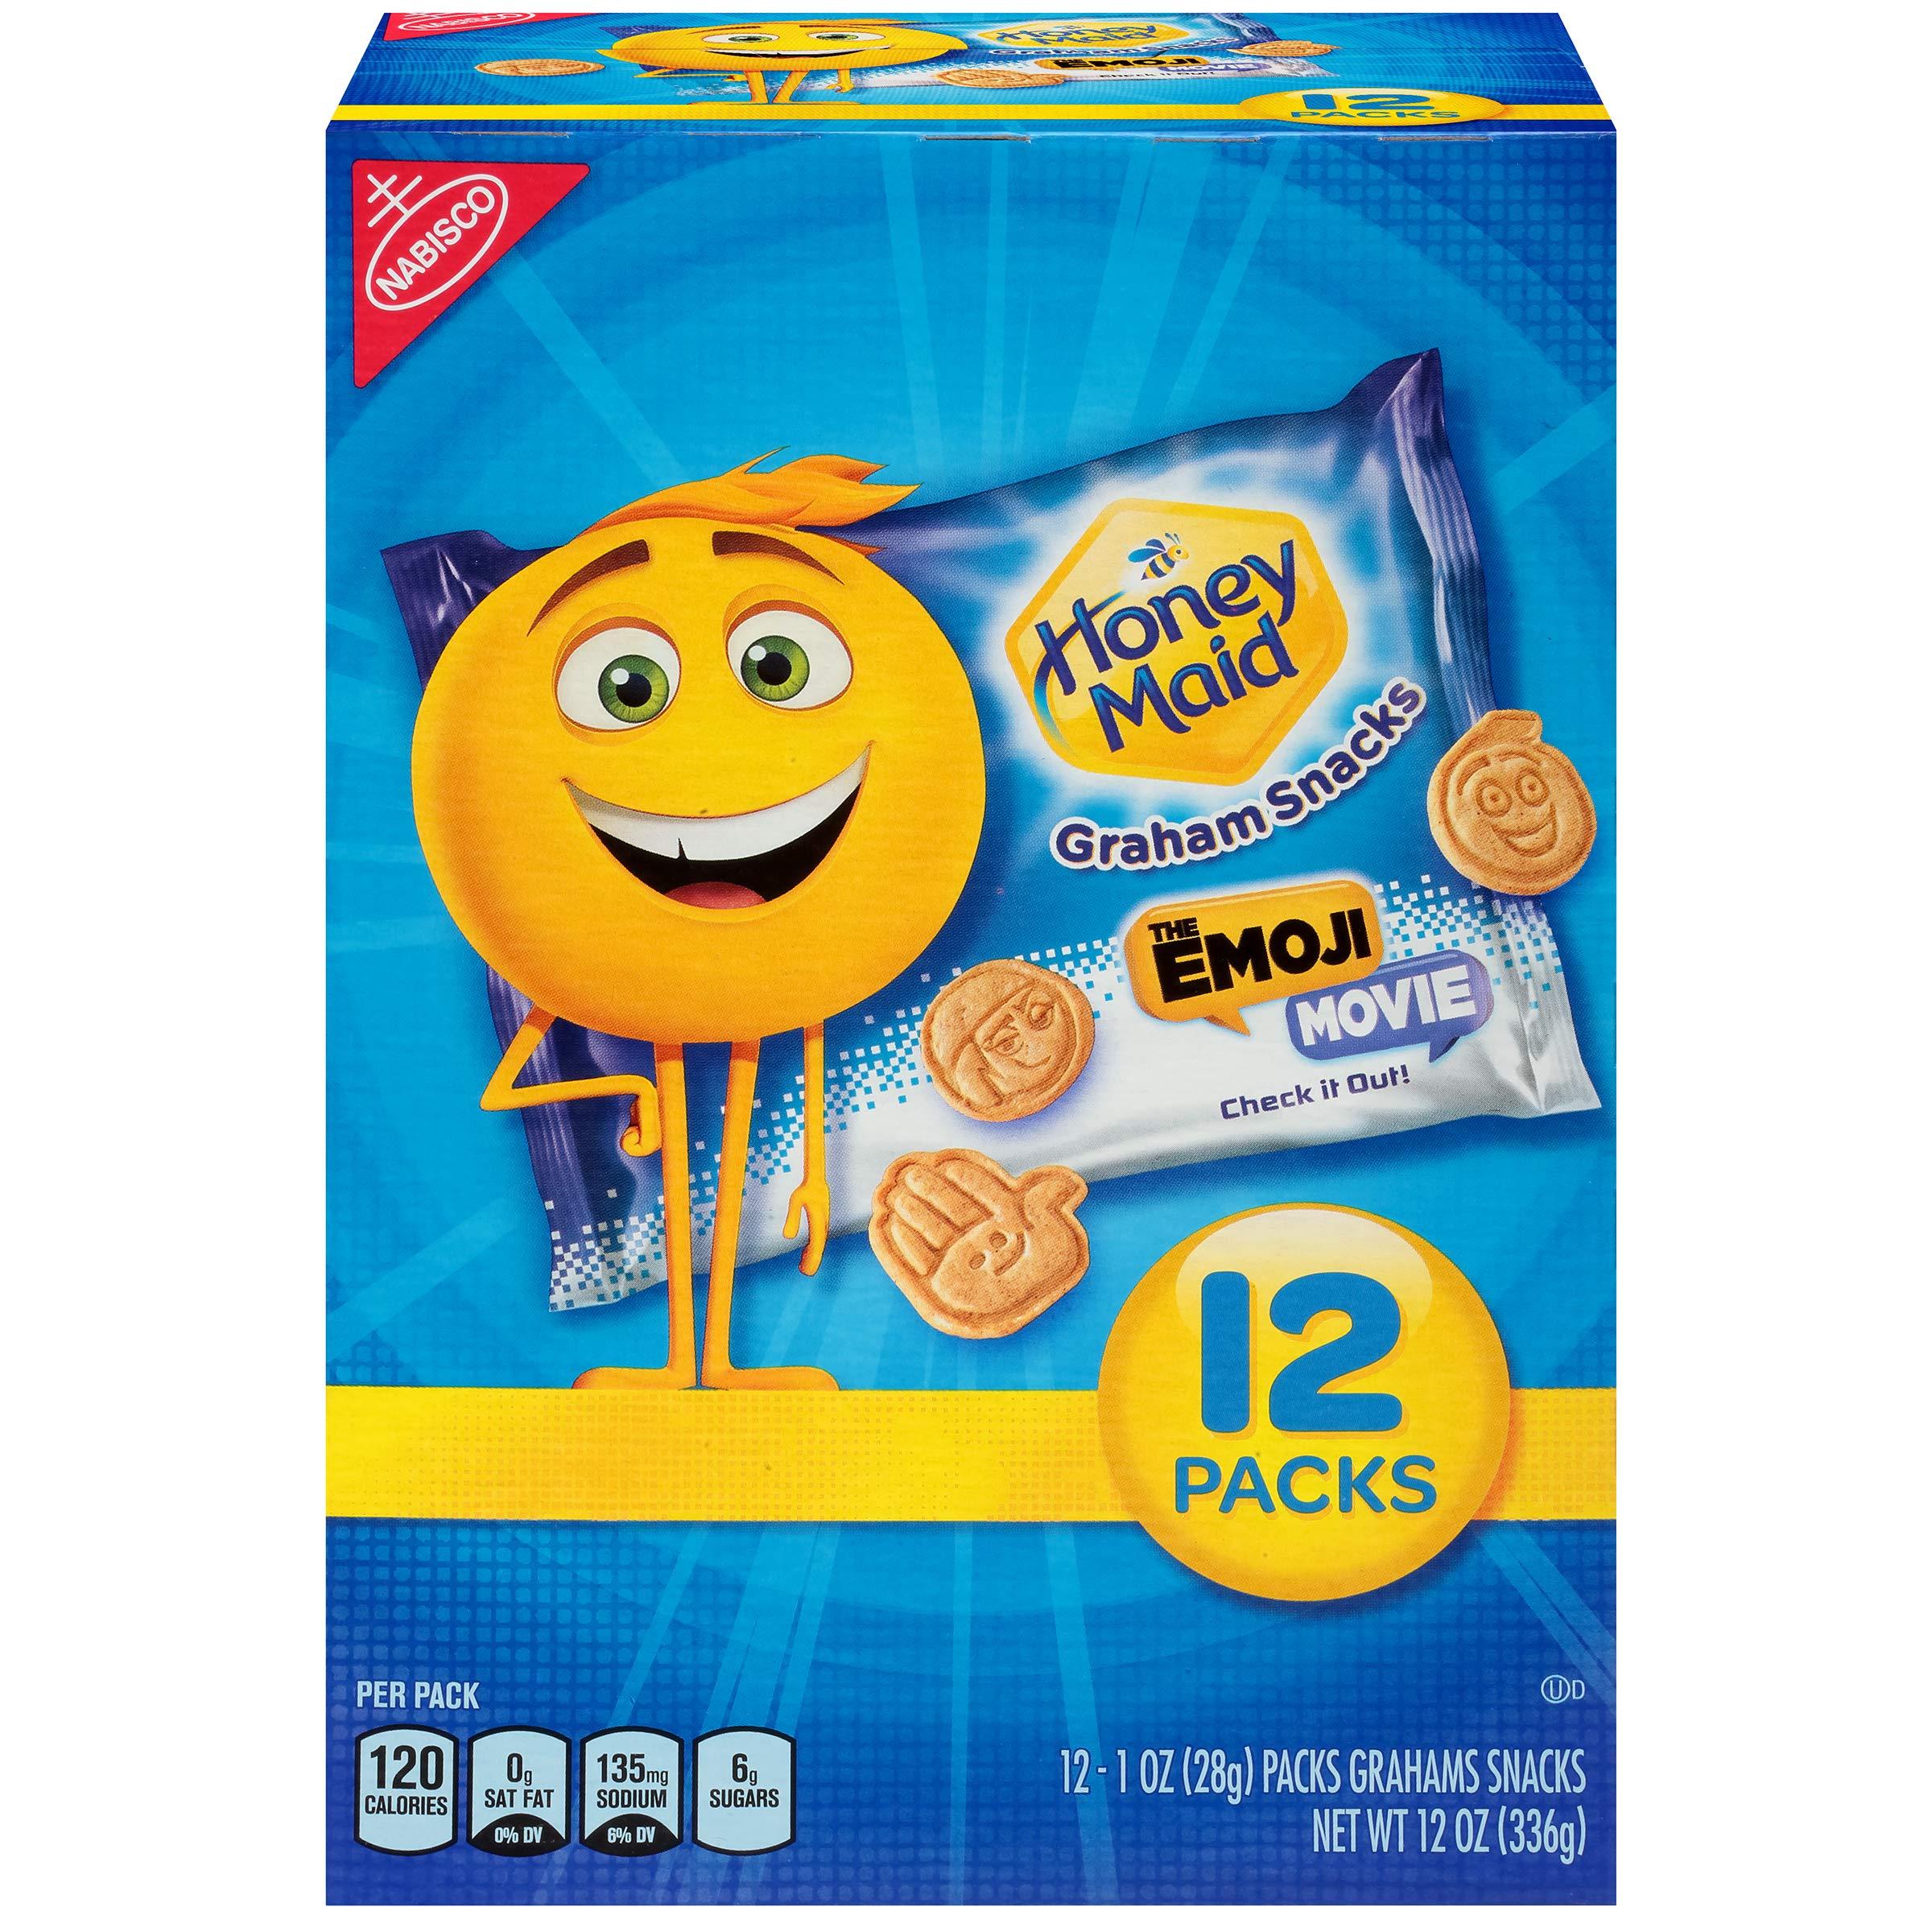 Honey Maid Graham Crackers - The Emoji Movie - Snack Packs, 12 Count Box, 12 Ounce